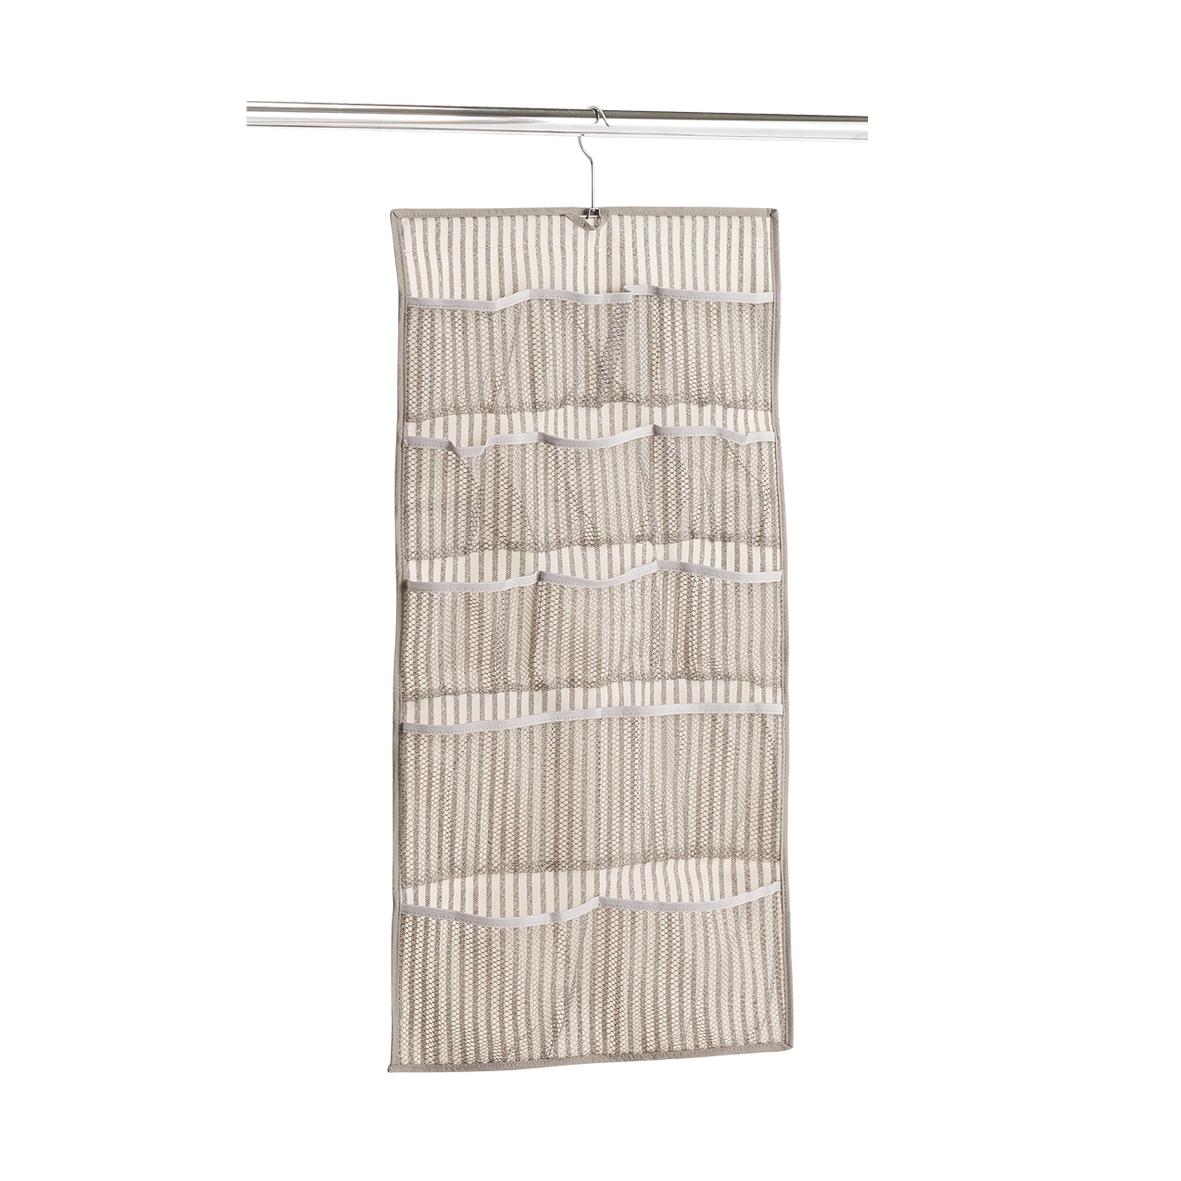 Organizator textil pentru dulap cu 12 compartimente, Bej Stripes, l40xH80 cm imagine